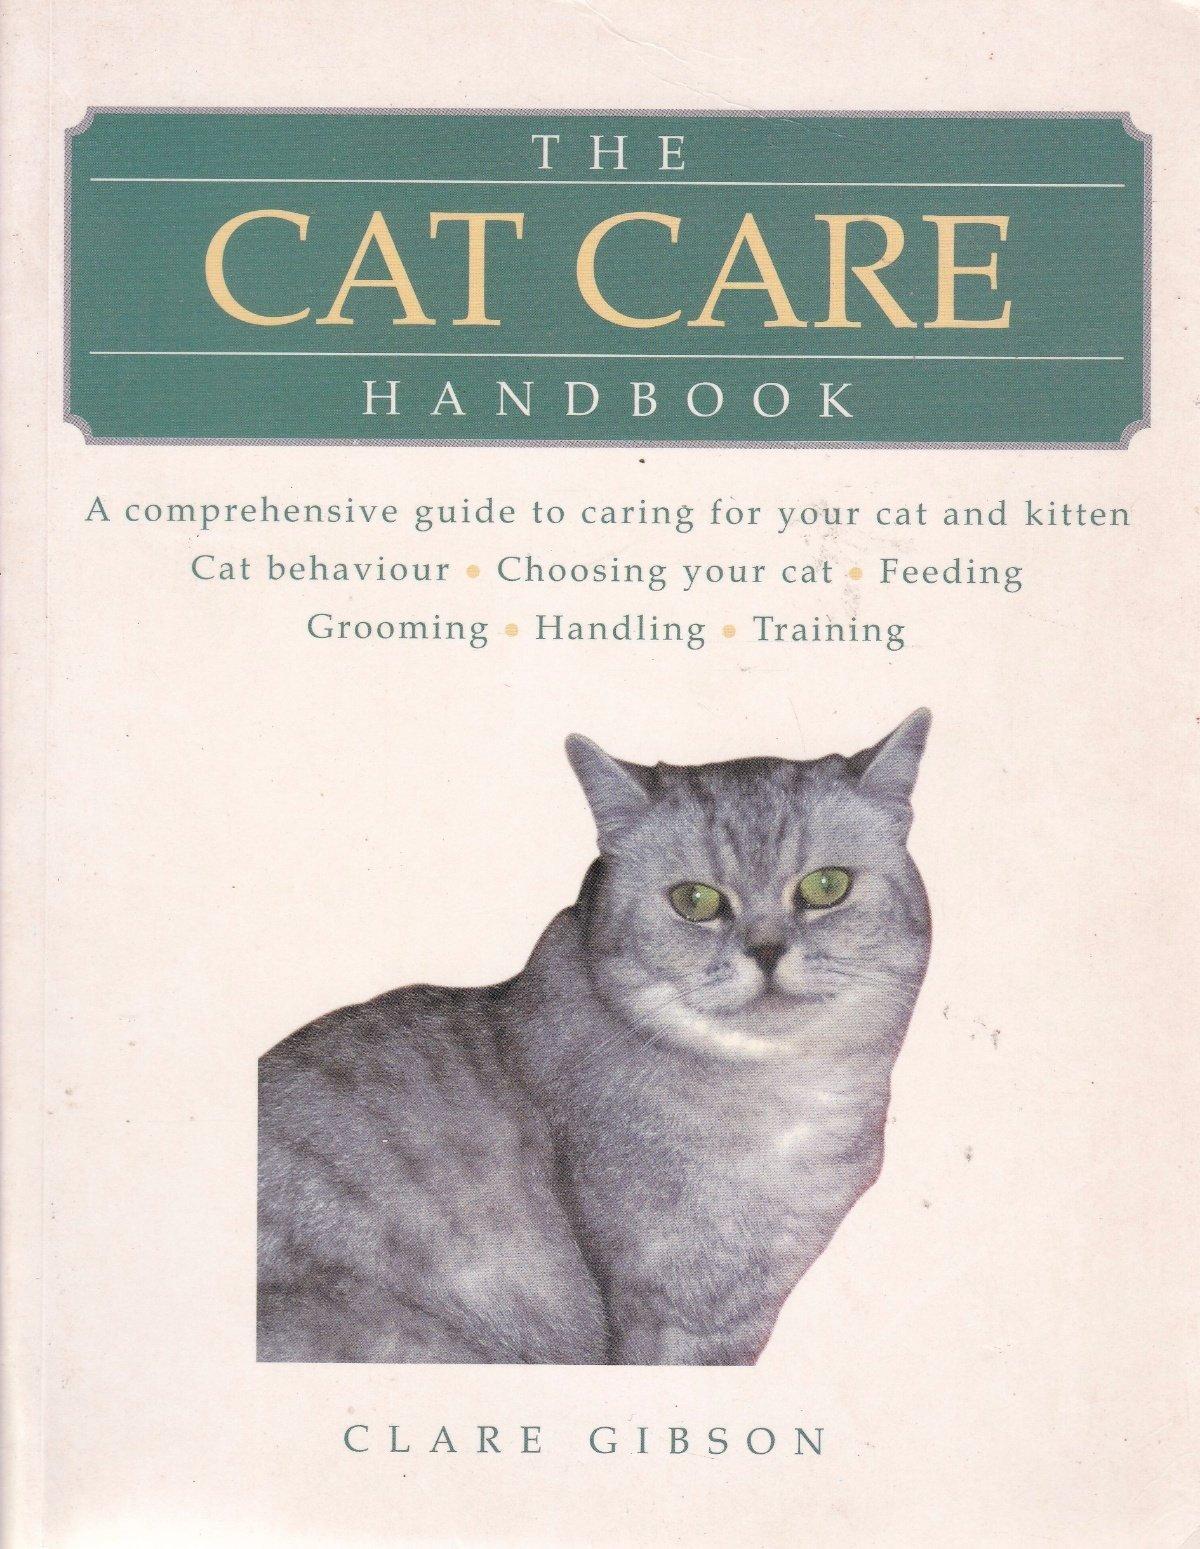 The Cat-Care Handbook